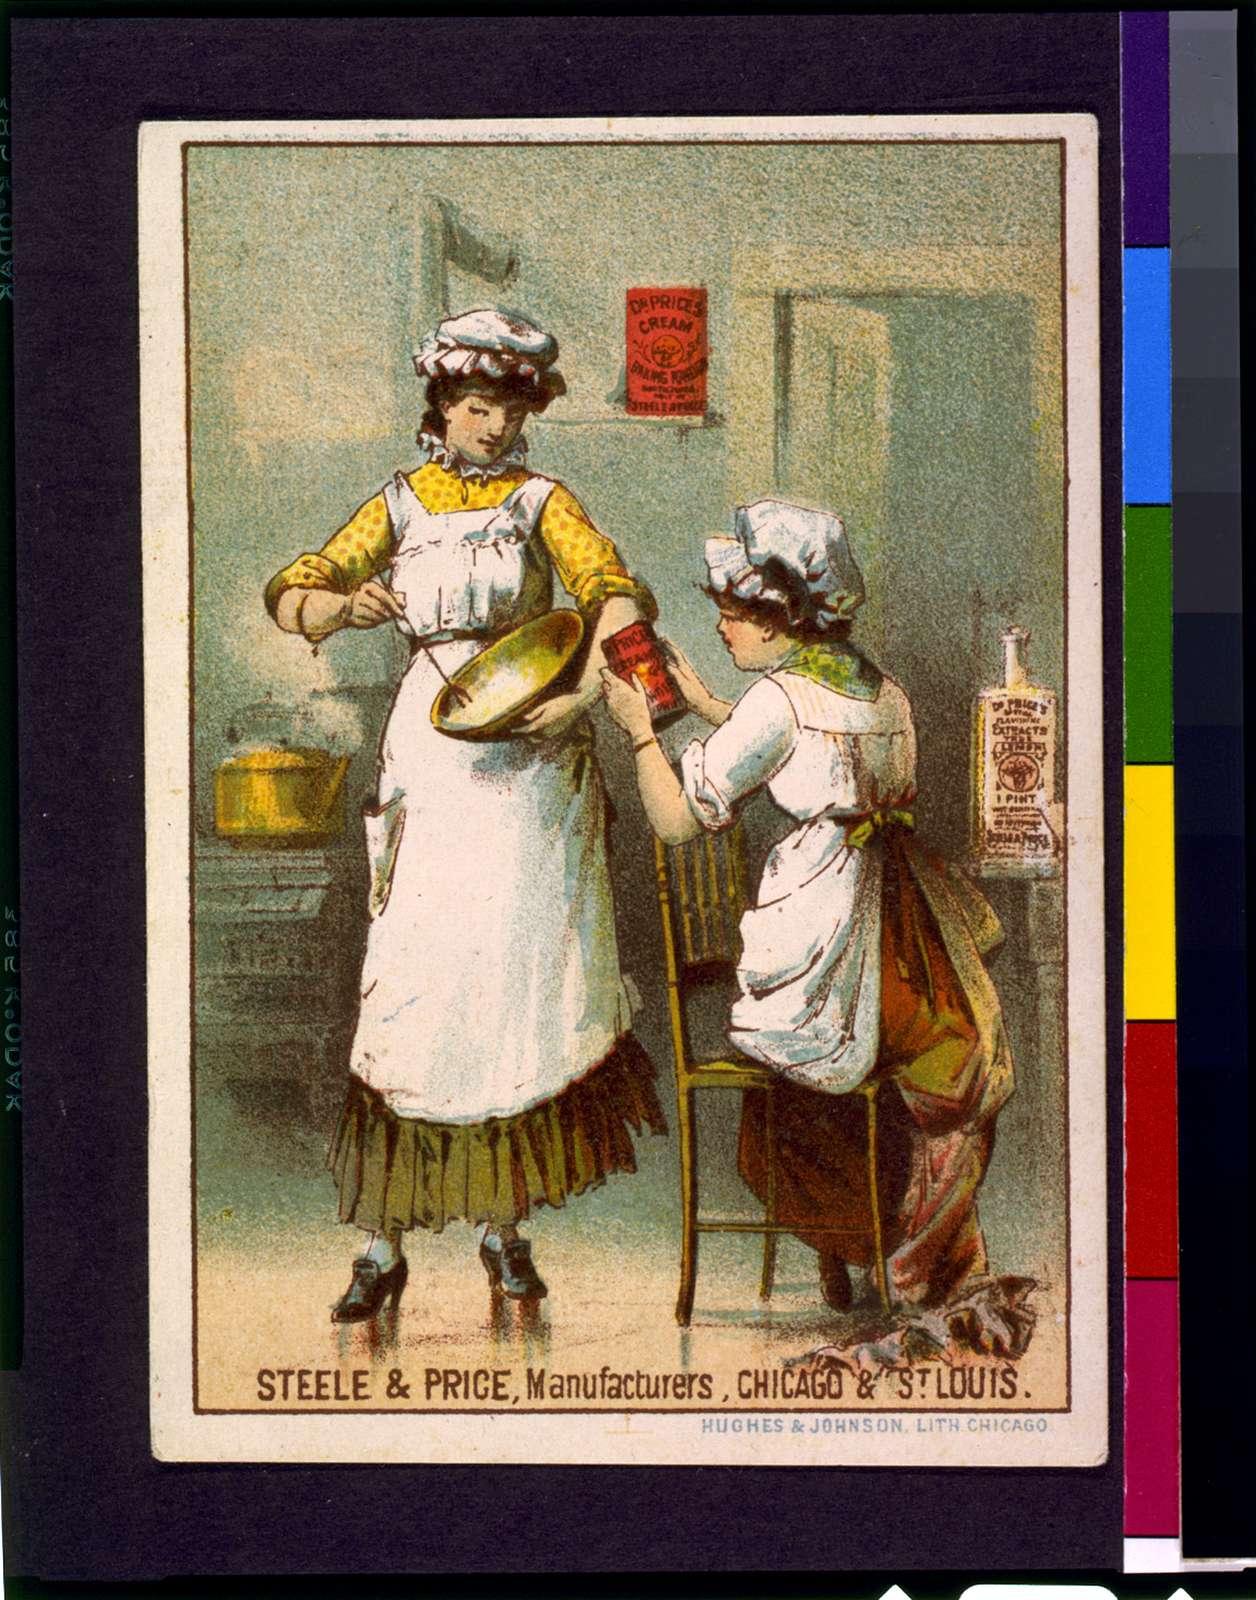 Dr. Price's cream baking powder Steele & Price, manufacturers, Chicago & St. Louis / / Hughes & Johnson, lith., Chicago.